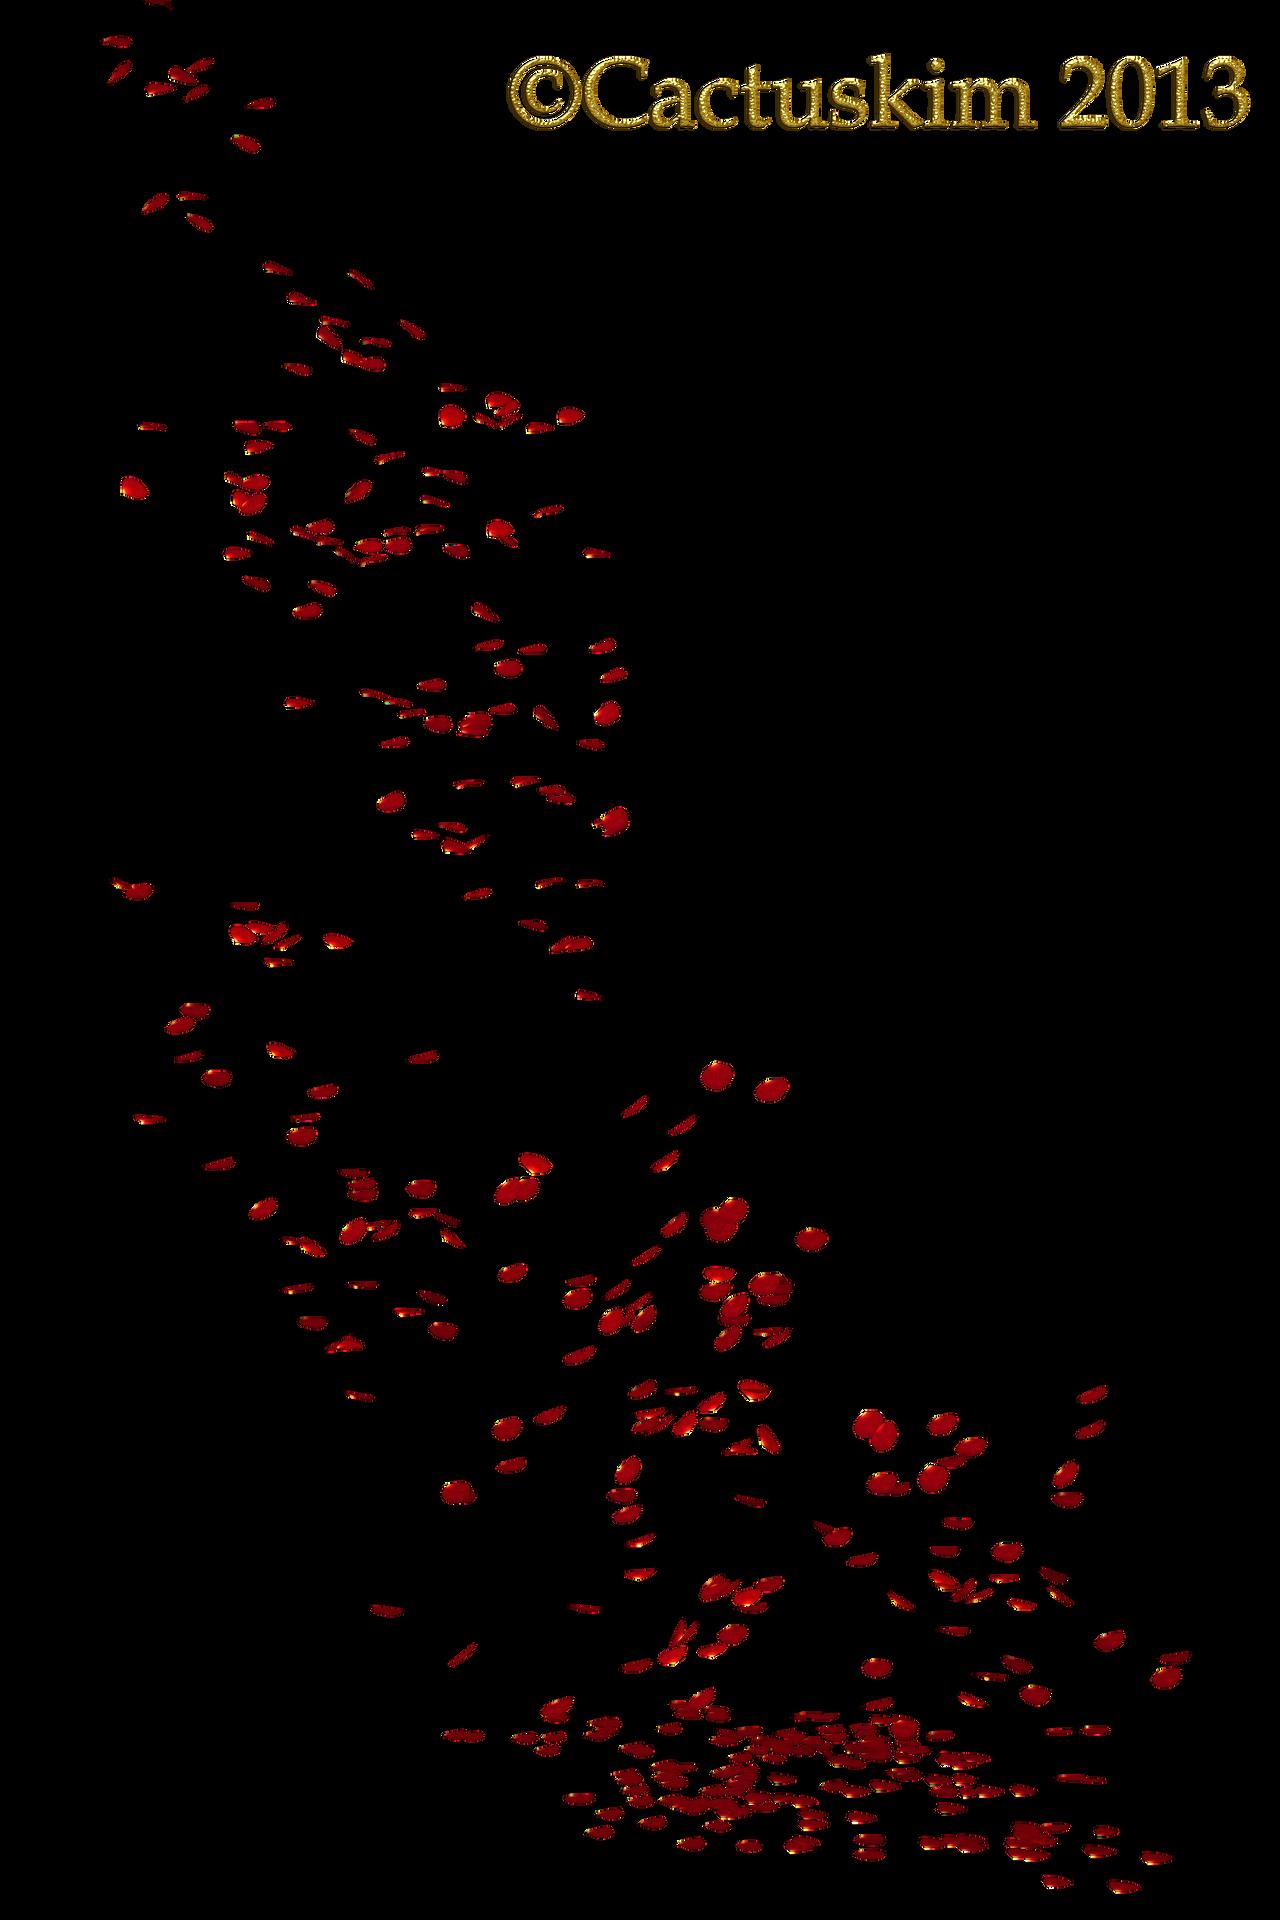 Falling Petals KL by cactuskim on DeviantArt Petals Falling From A Flower